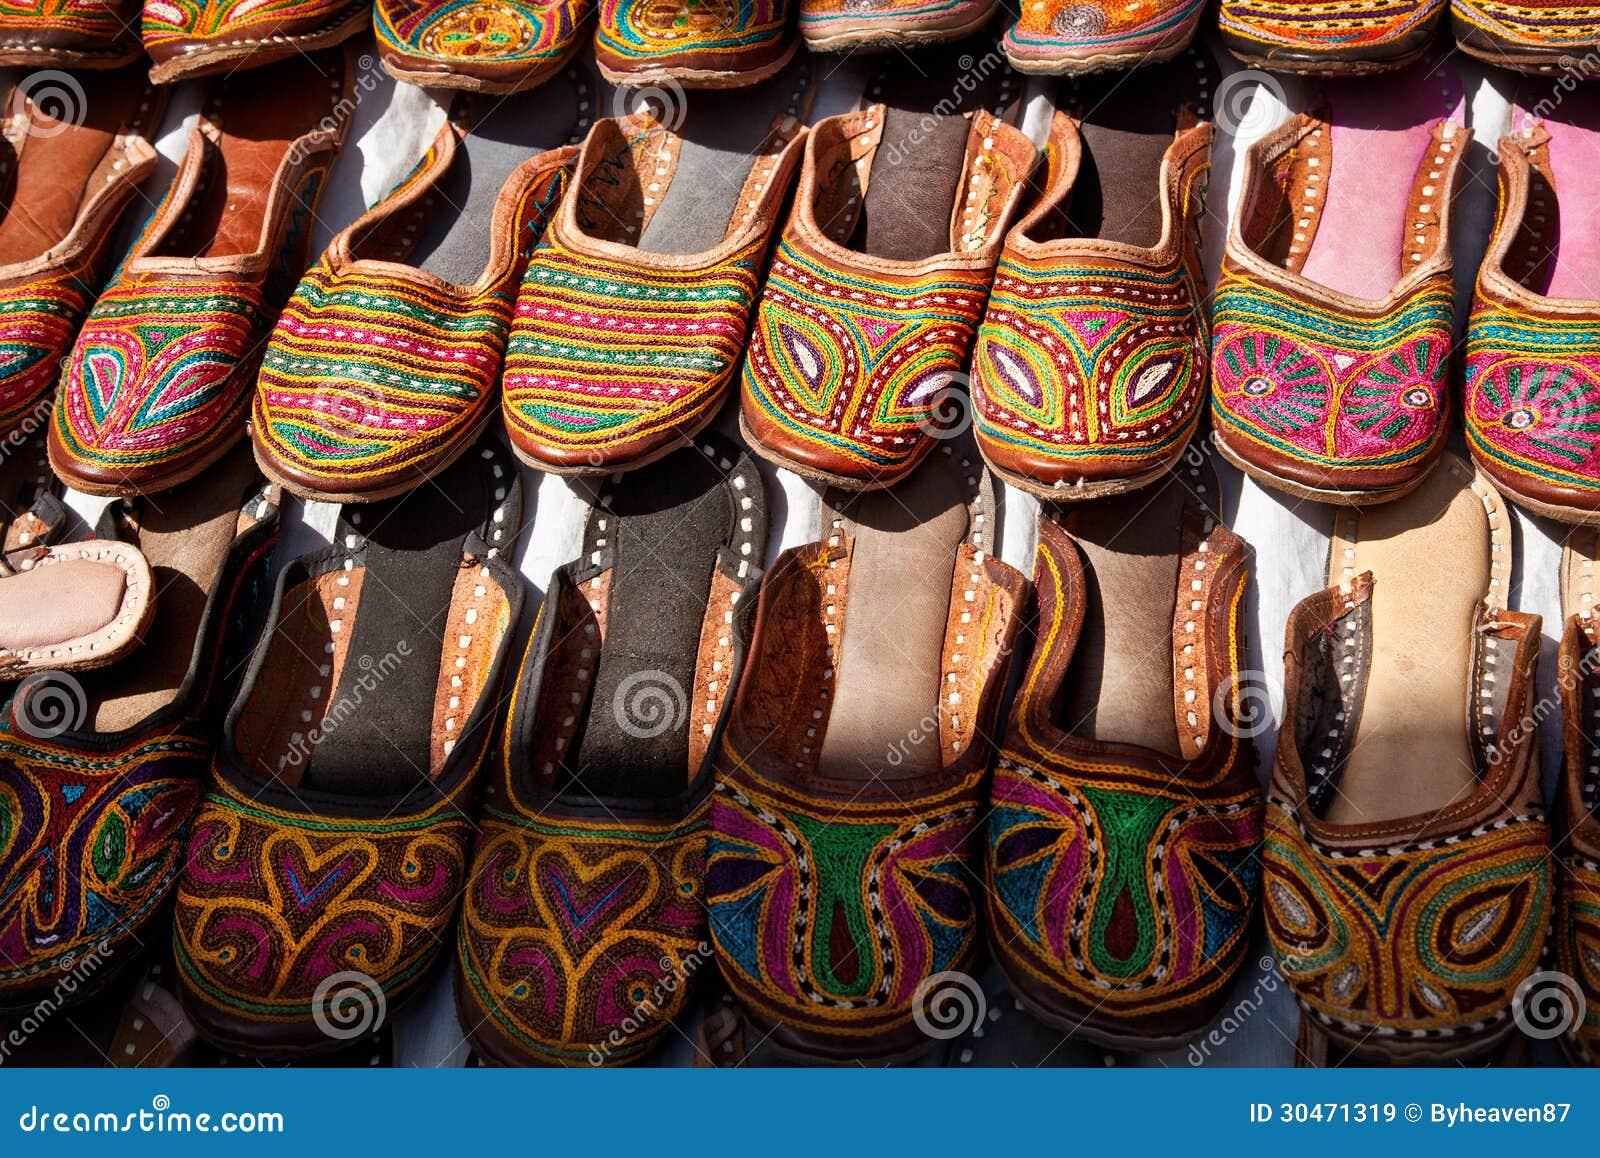 aa059a313af7 Εθνικά παπούτσια στοκ εικόνα. εικόνα από δώρο, ινδία - 30471319